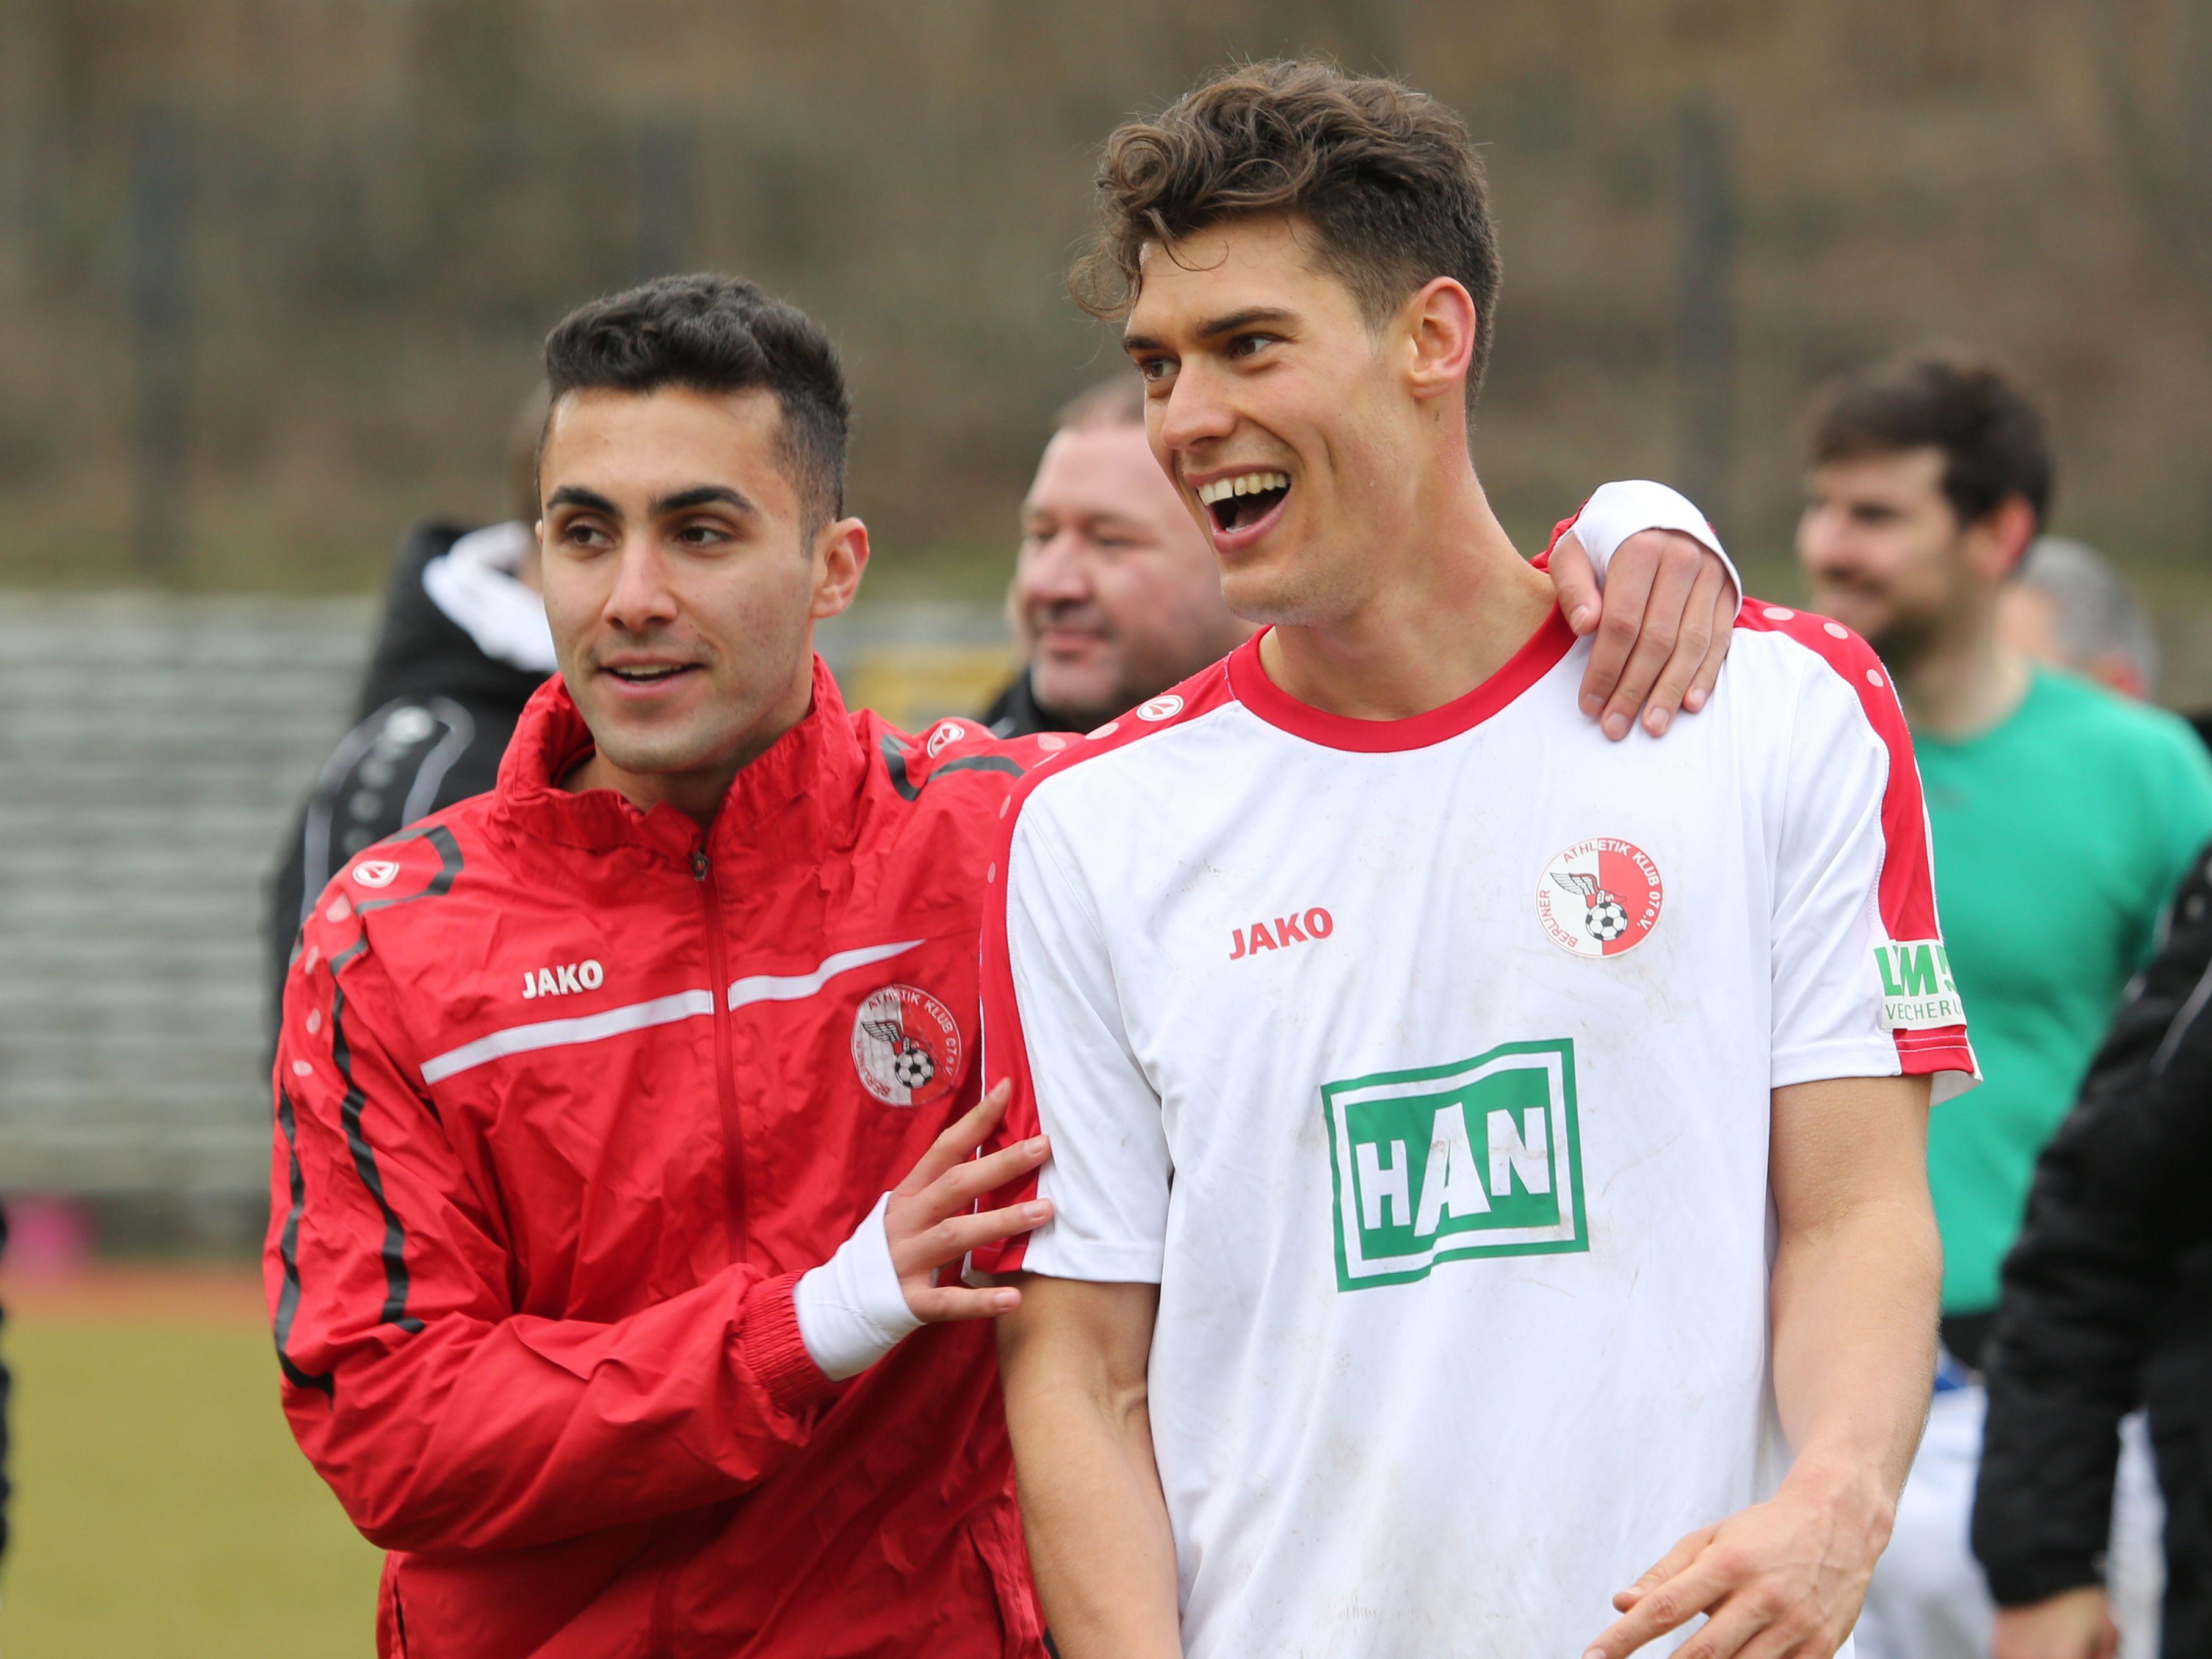 #Kaan #Gül (links) &Torschütze zum 3:0 #Miroslav #Slavov freuen sich über den wichtigen Sieg.